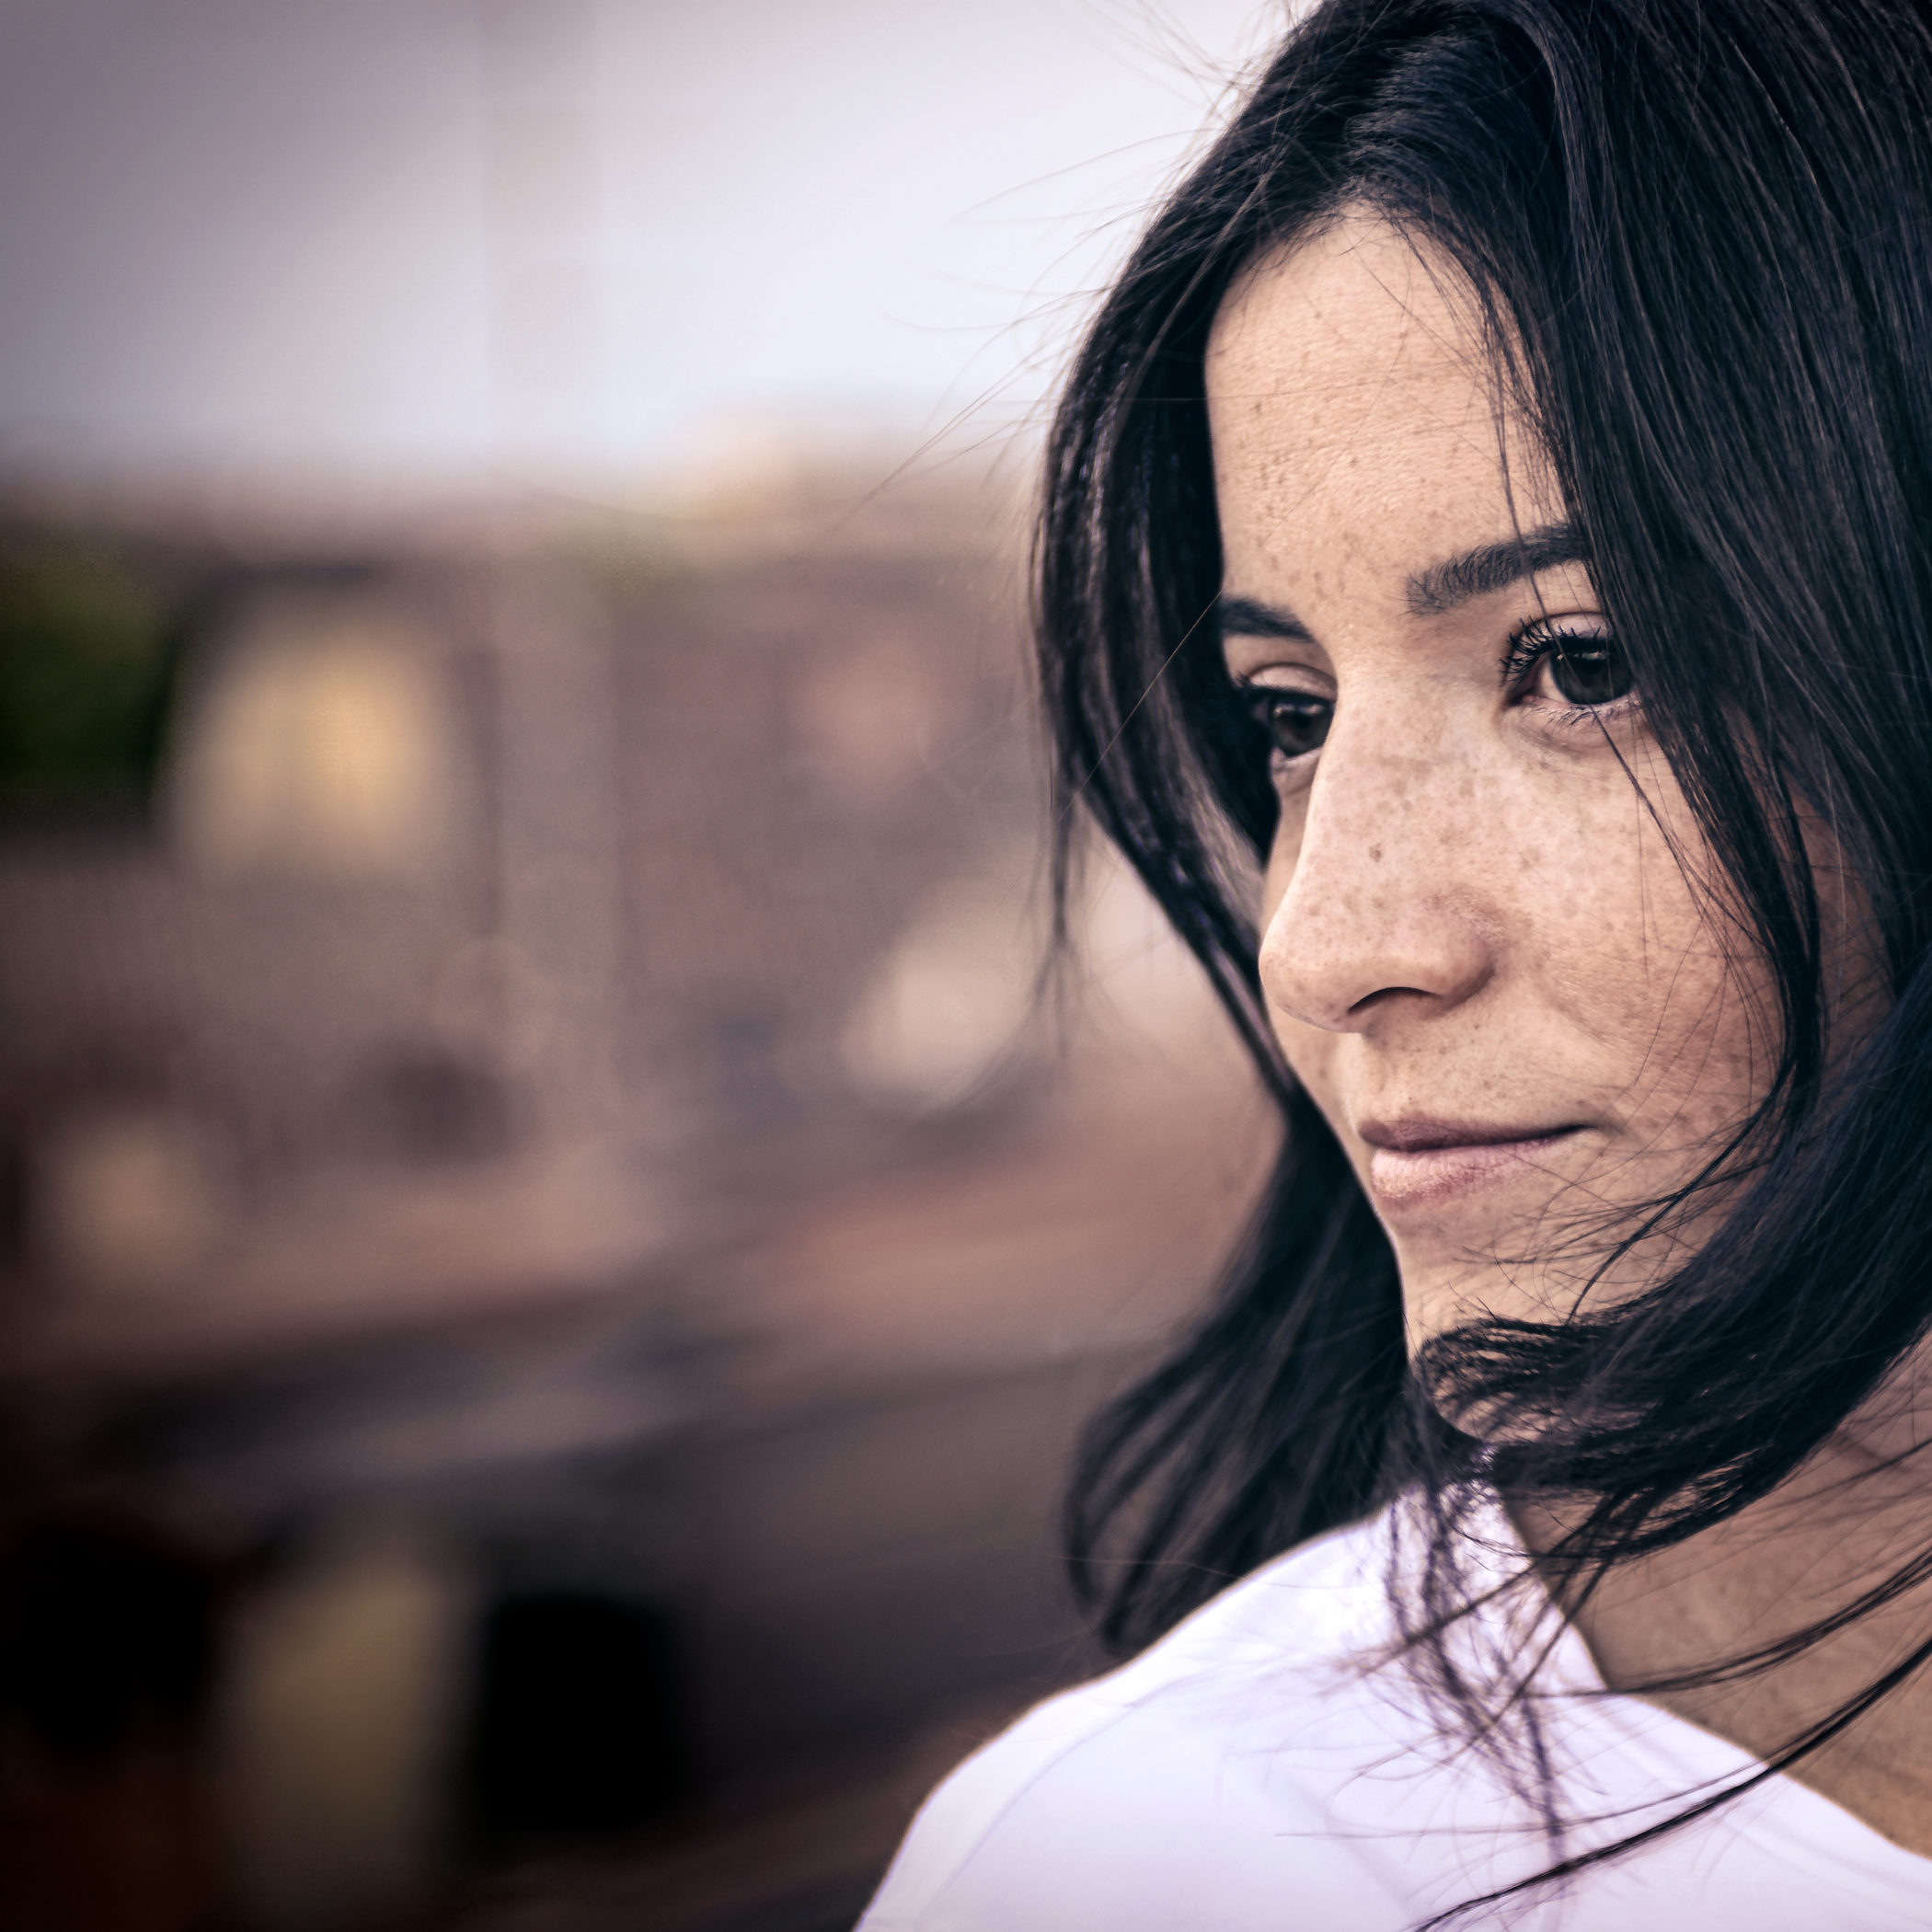 DSC6354 scaled - Alessia Verona